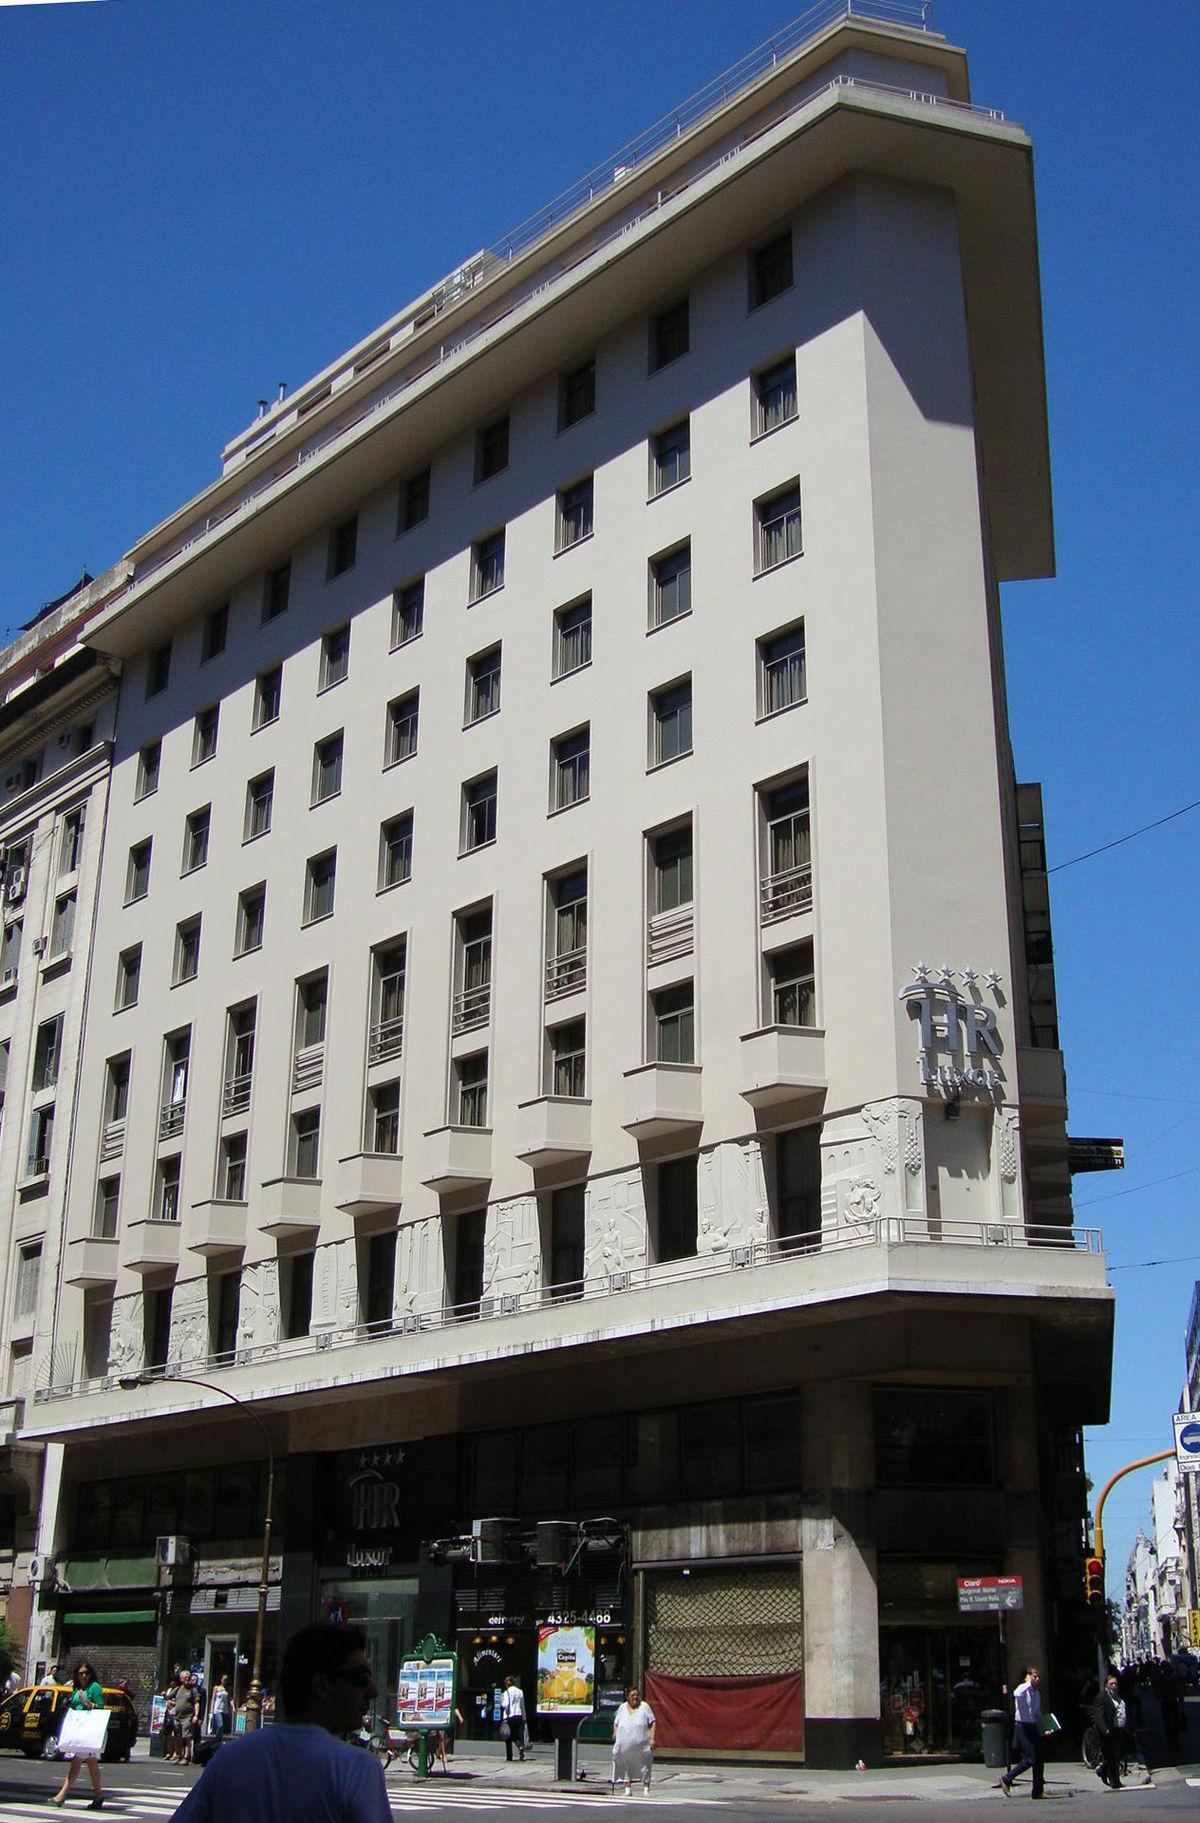 Hotel reconquista luxor wikipedia la enciclopedia libre for Art deco hotel buenos aires